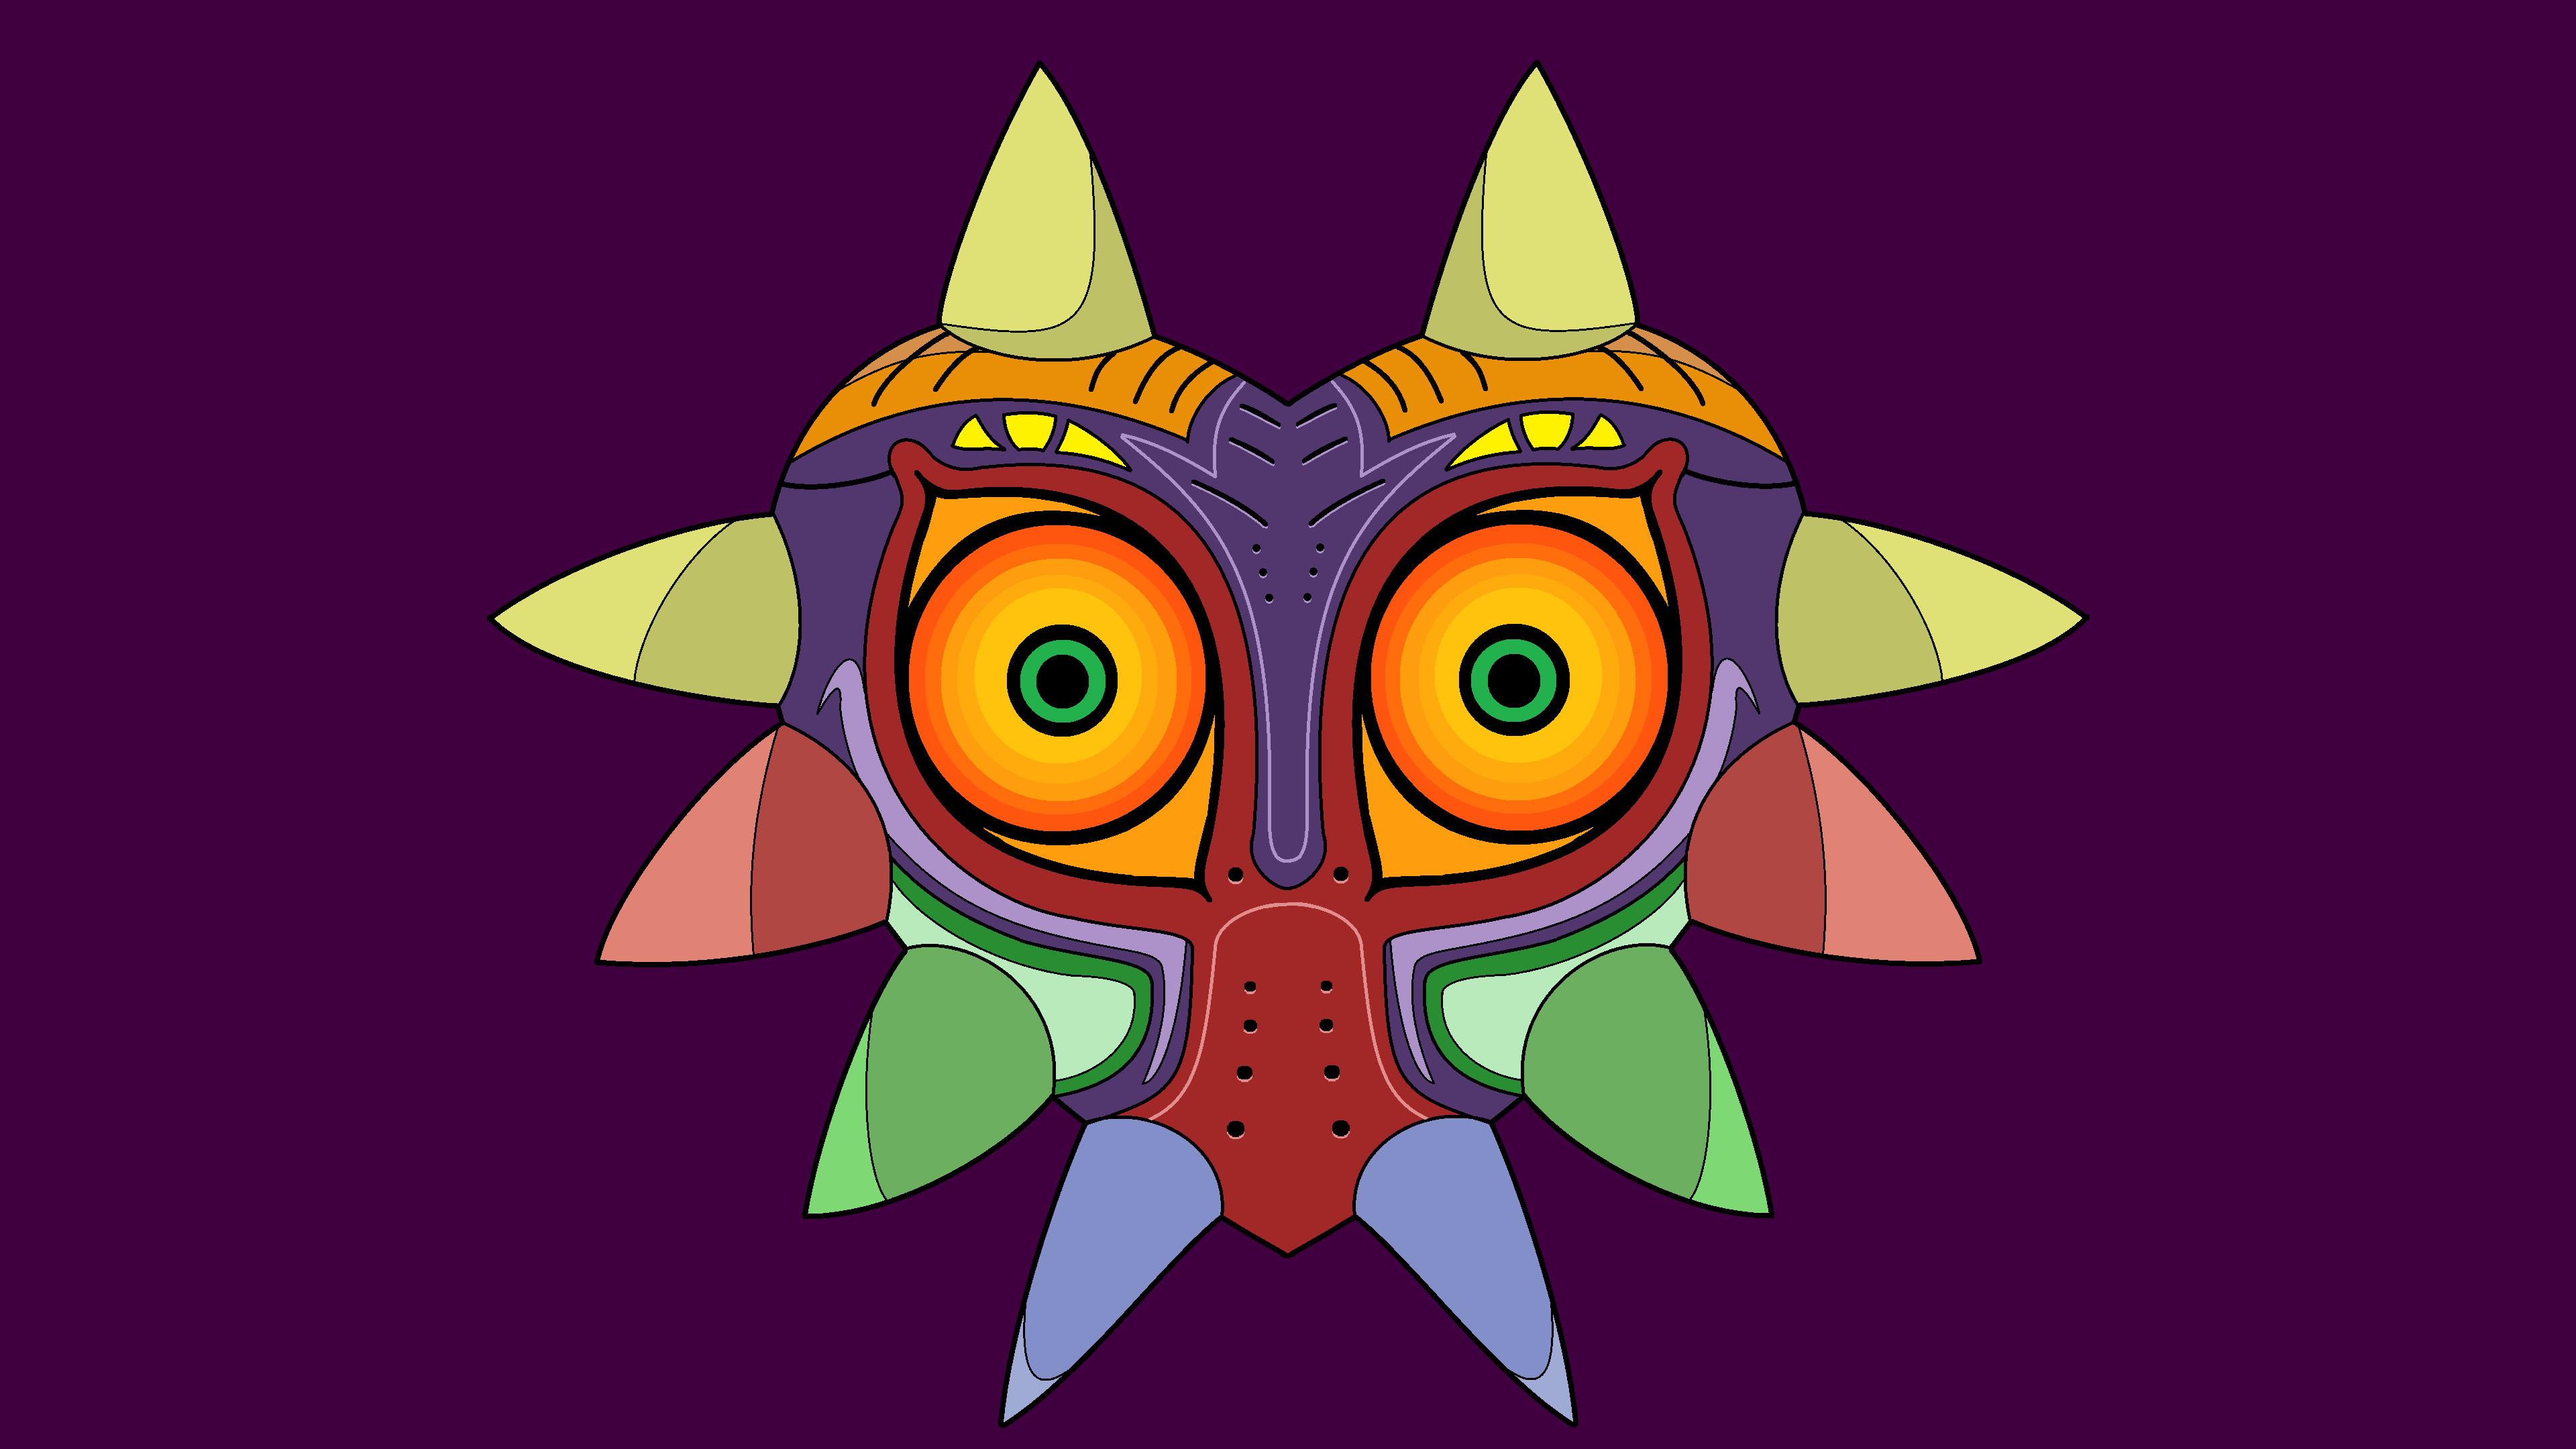 Majoras Mask Wallpaper (81+ images)